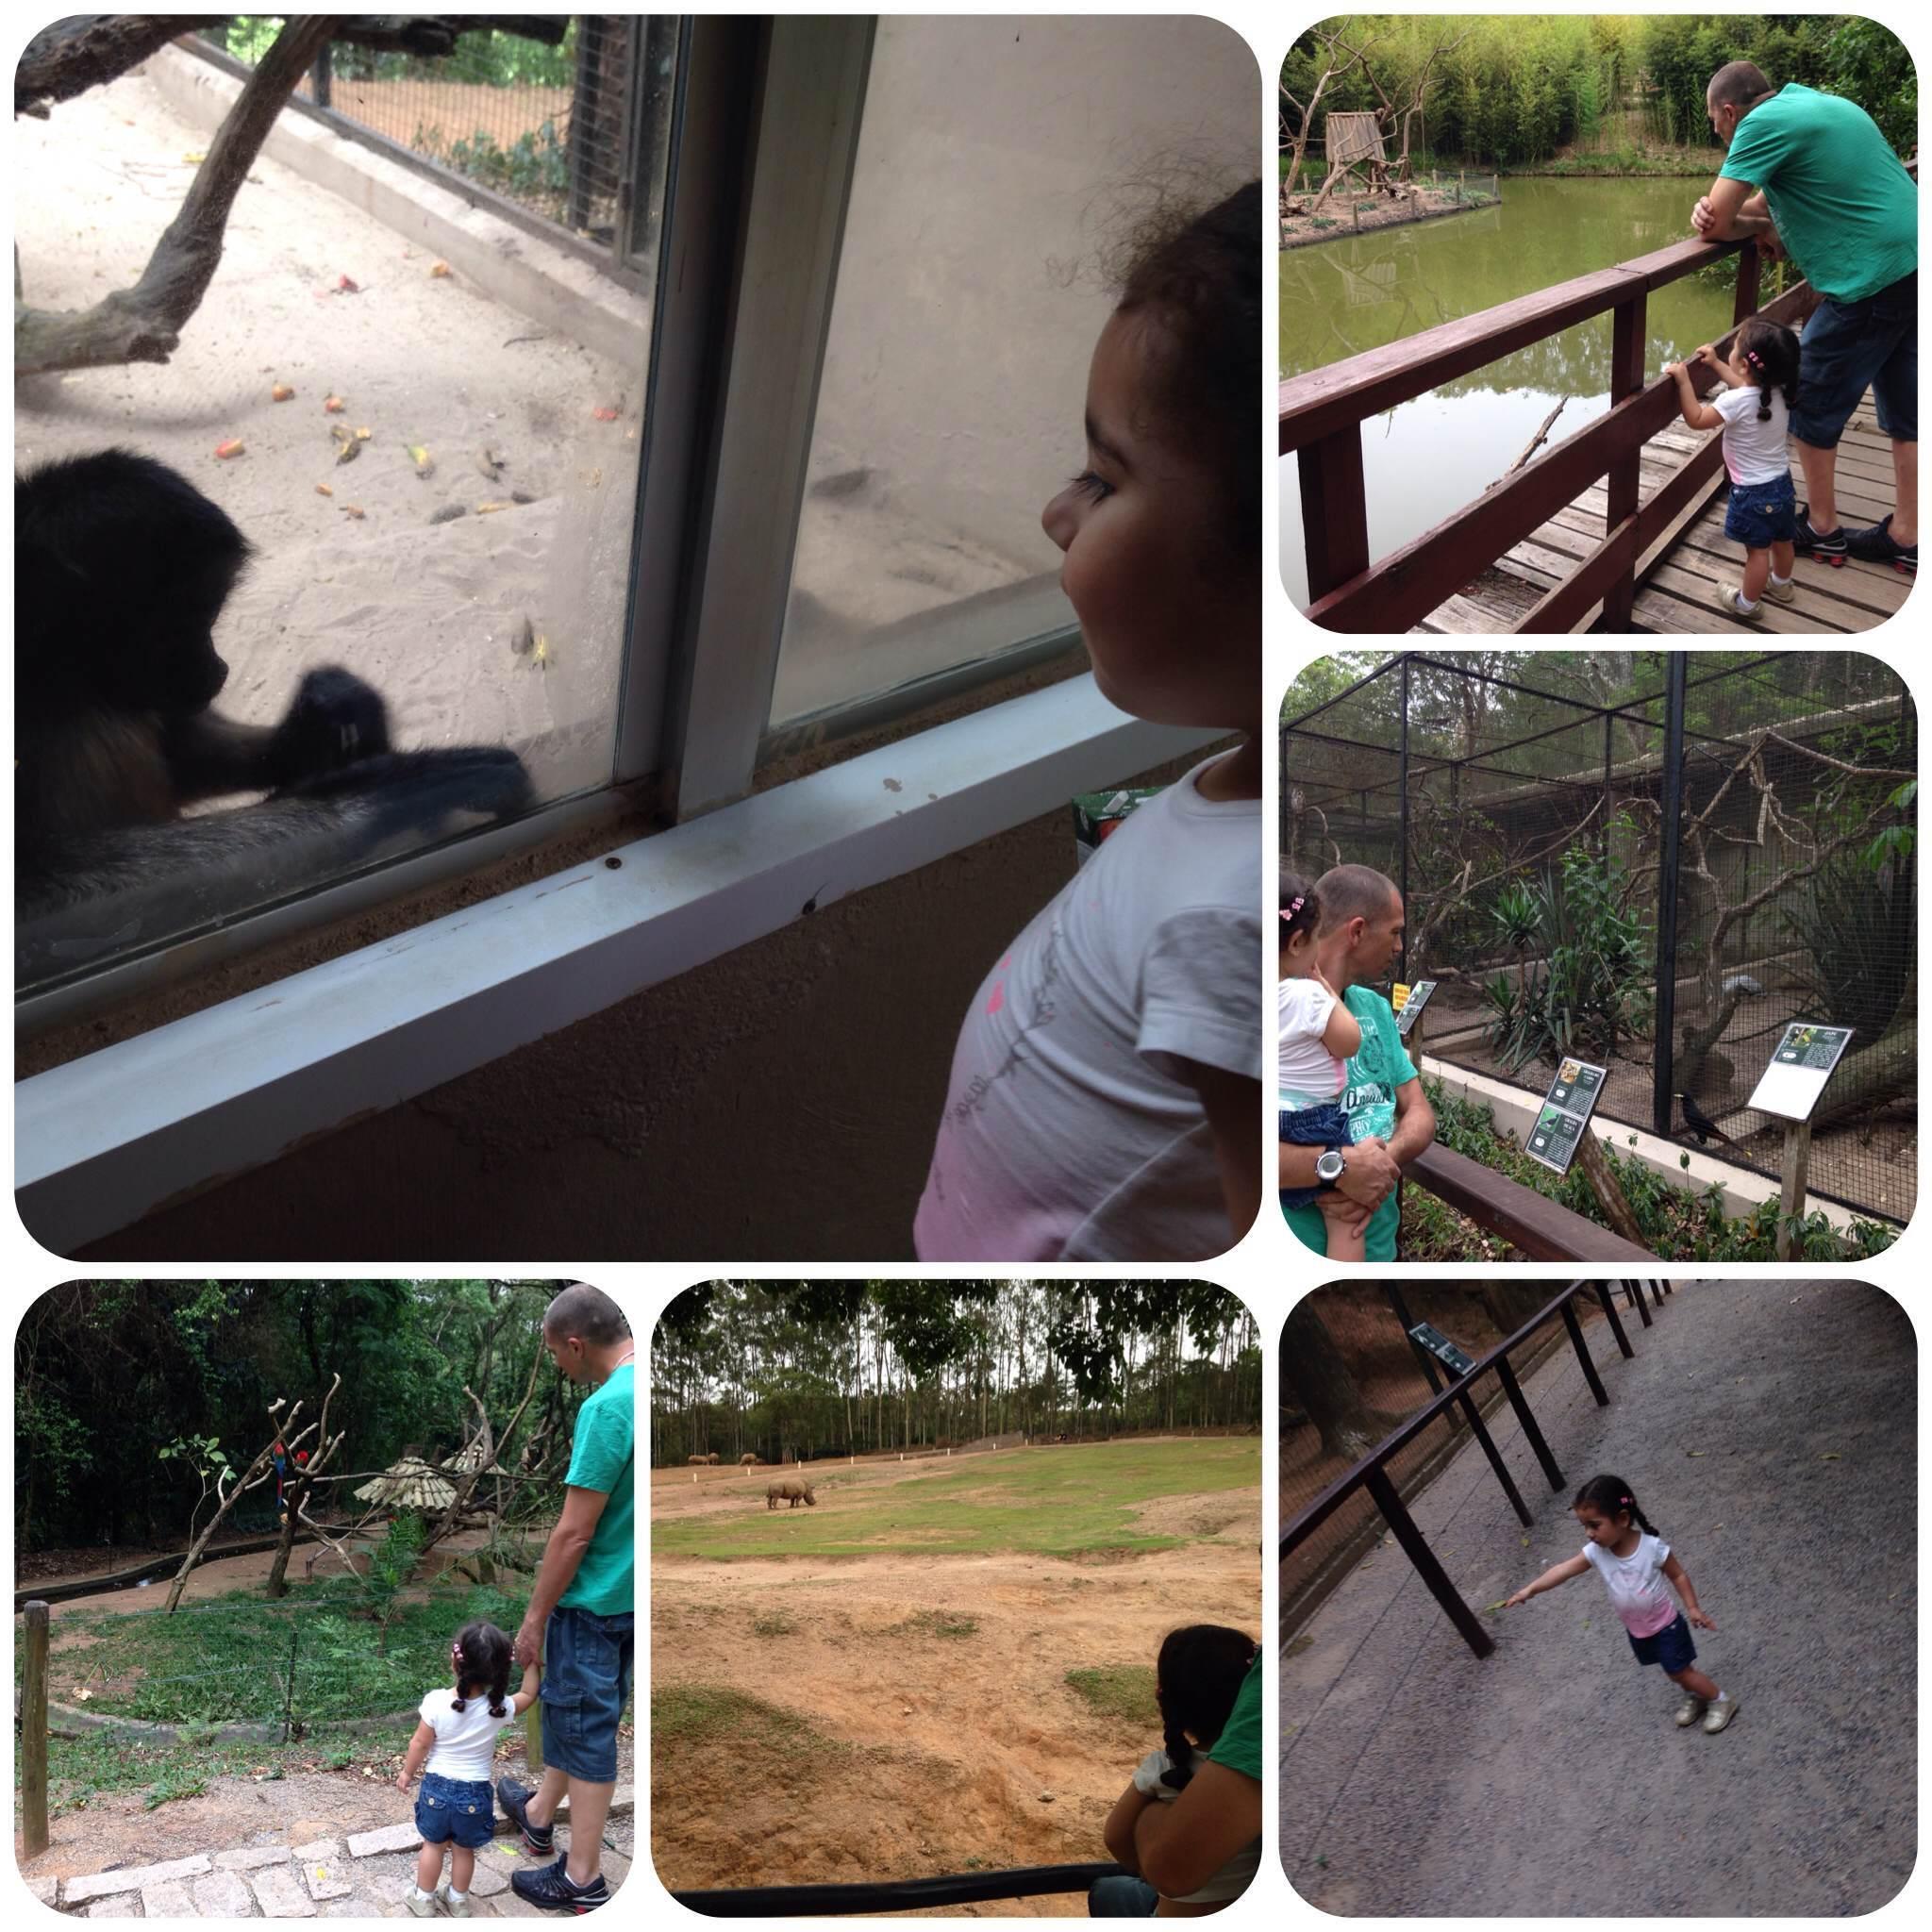 ZooParque: Zoológico em Itatiba, passeio pra toda família